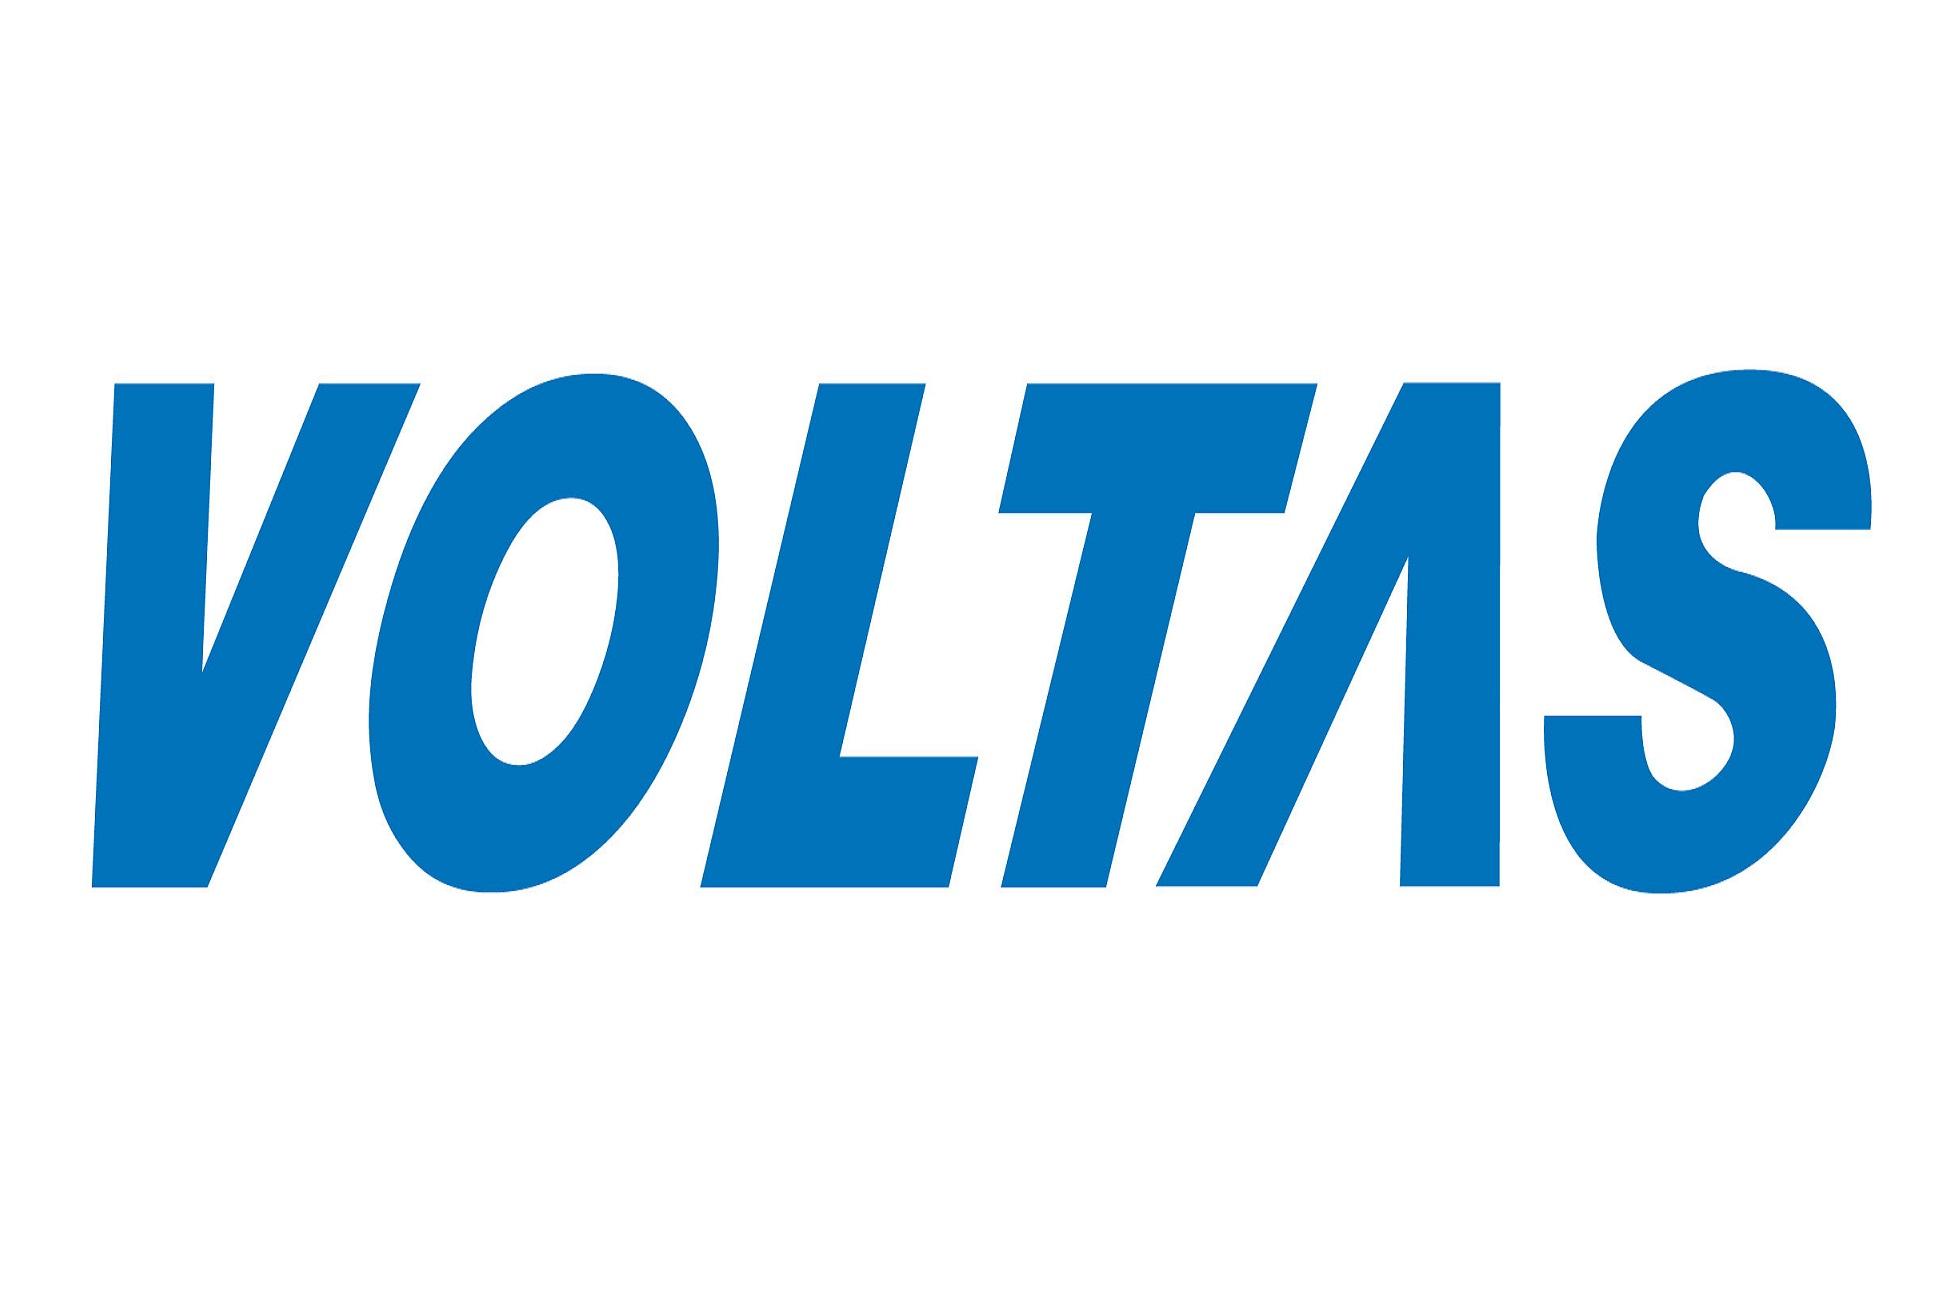 air conditioner: voltas. Review on Voltas 155CYA 1.2 Ton 5 Star Split #0271B8